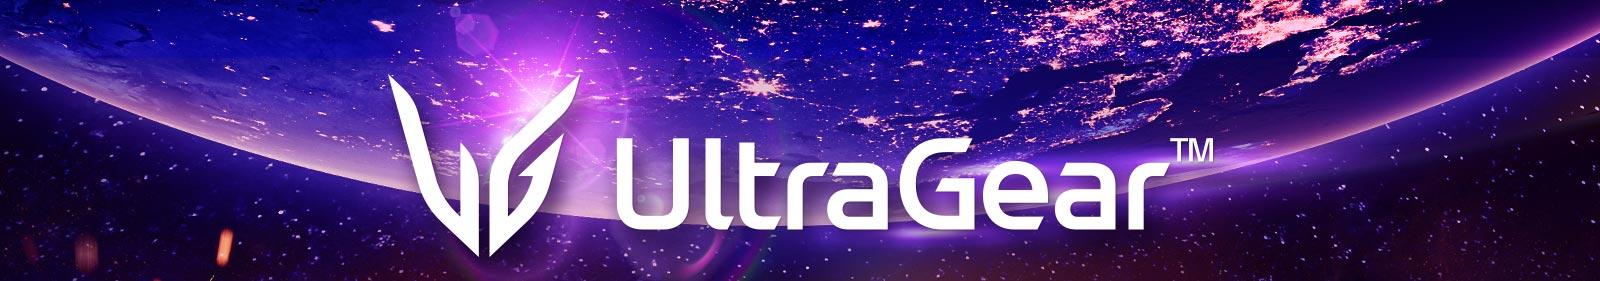 LG UltraGear 27GN950 B Gaming Monitor Logo